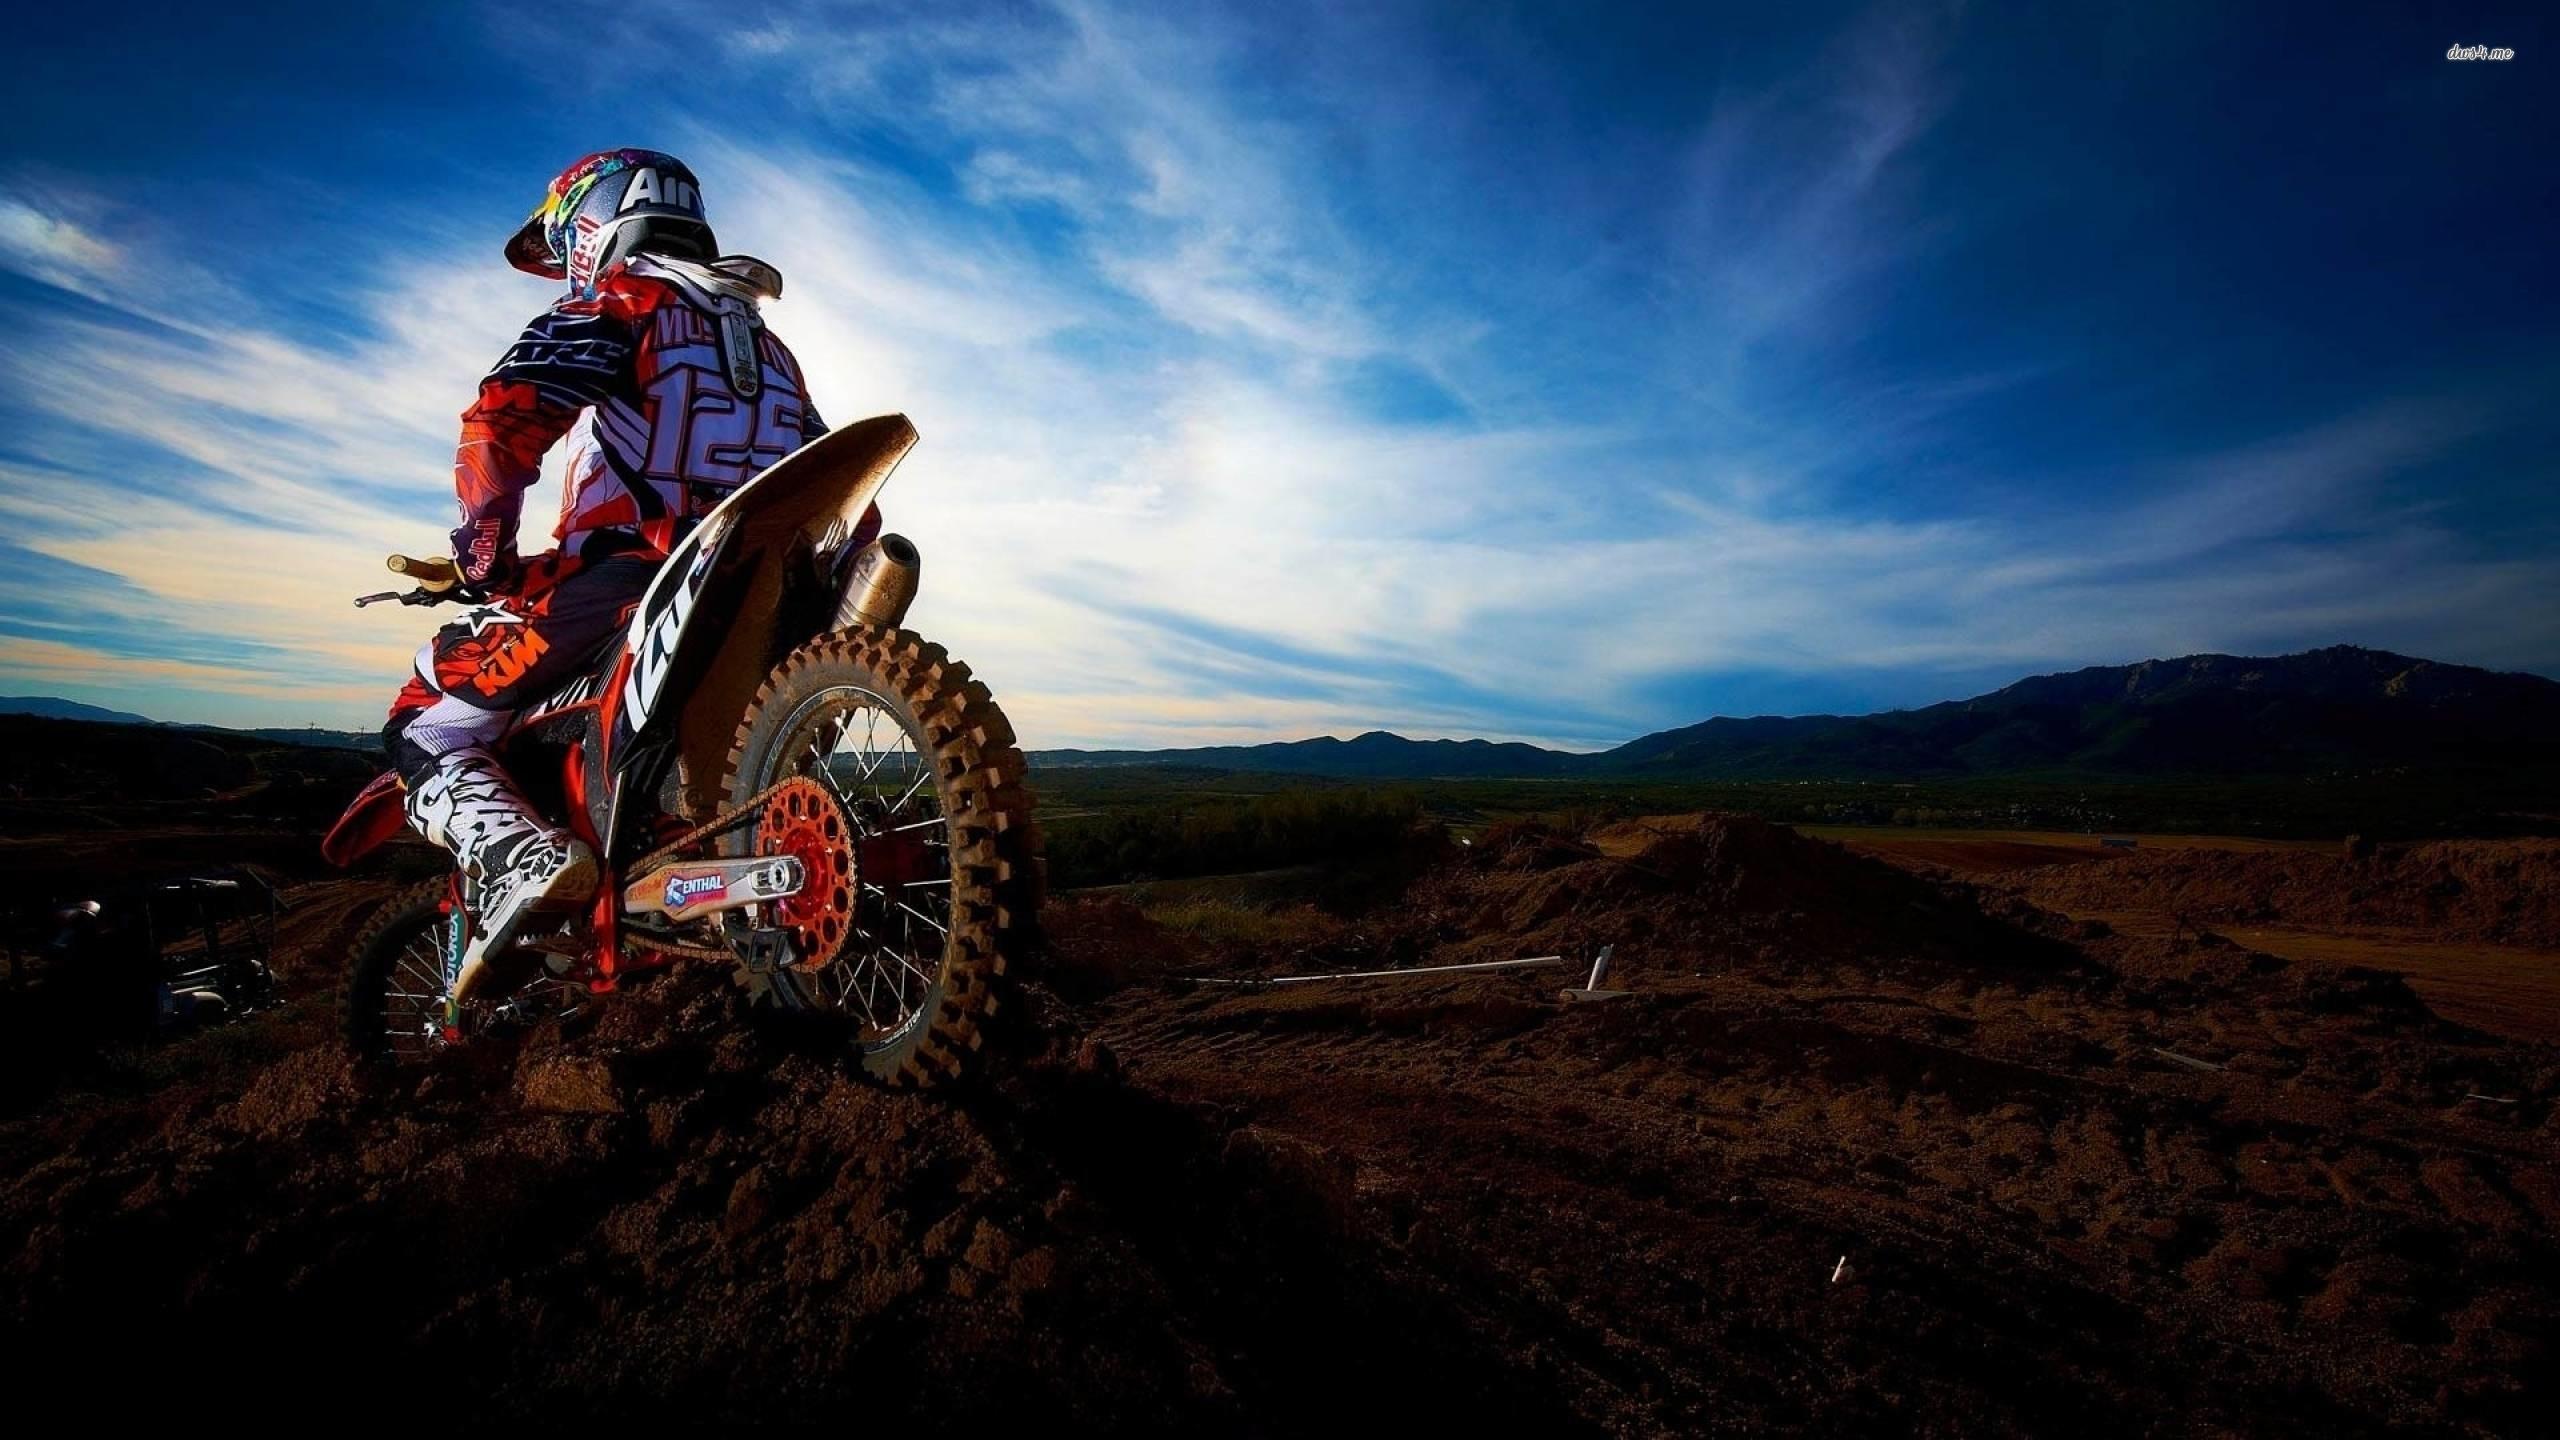 Motocross Wallpapers – Wide wallpapers – Widewallpapers.